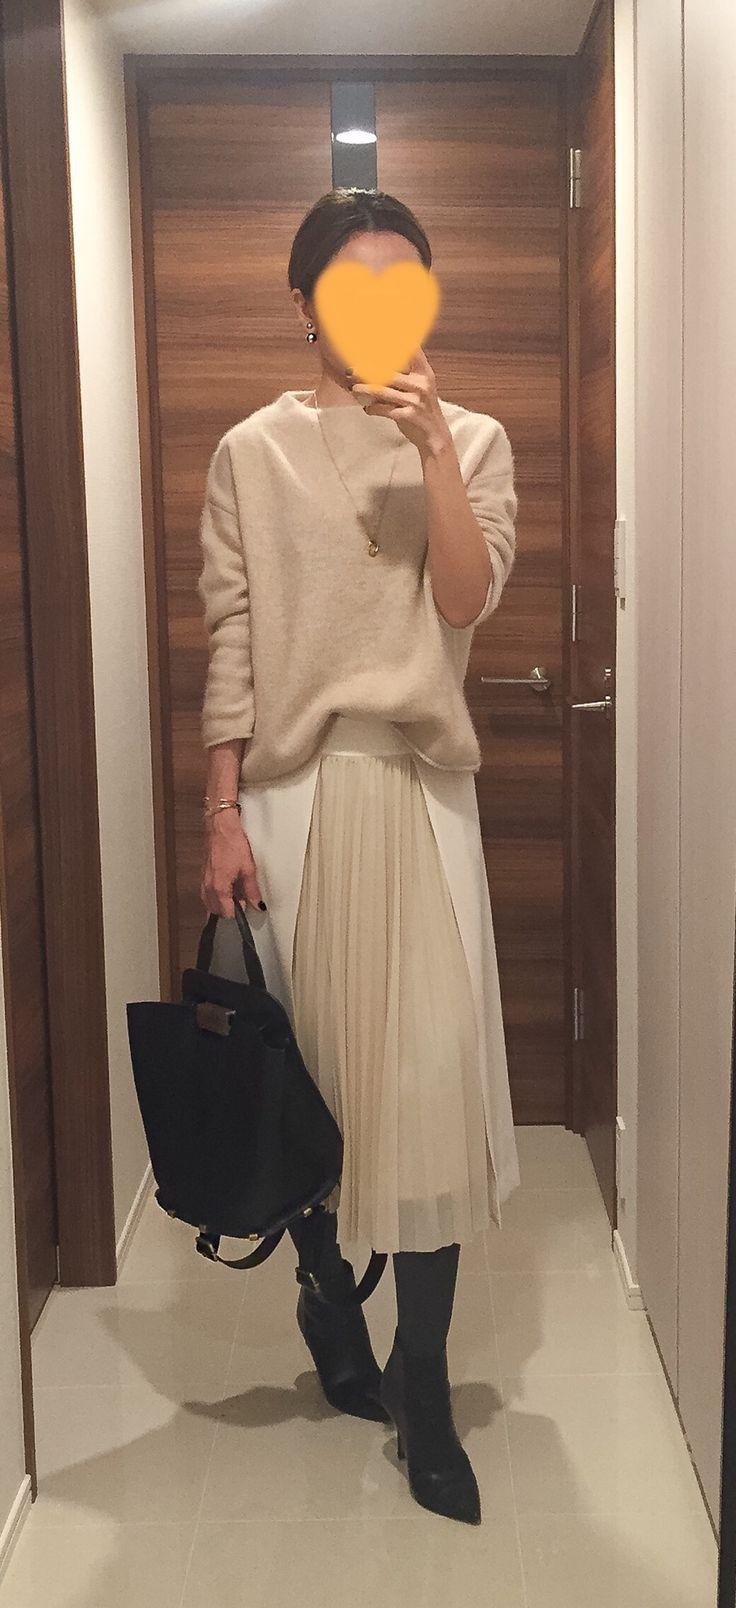 Beige sweater: Des Pres, White long skirt: Des Pres, Bag: ZAC Zac Posen, Boots: Jimmy Choo